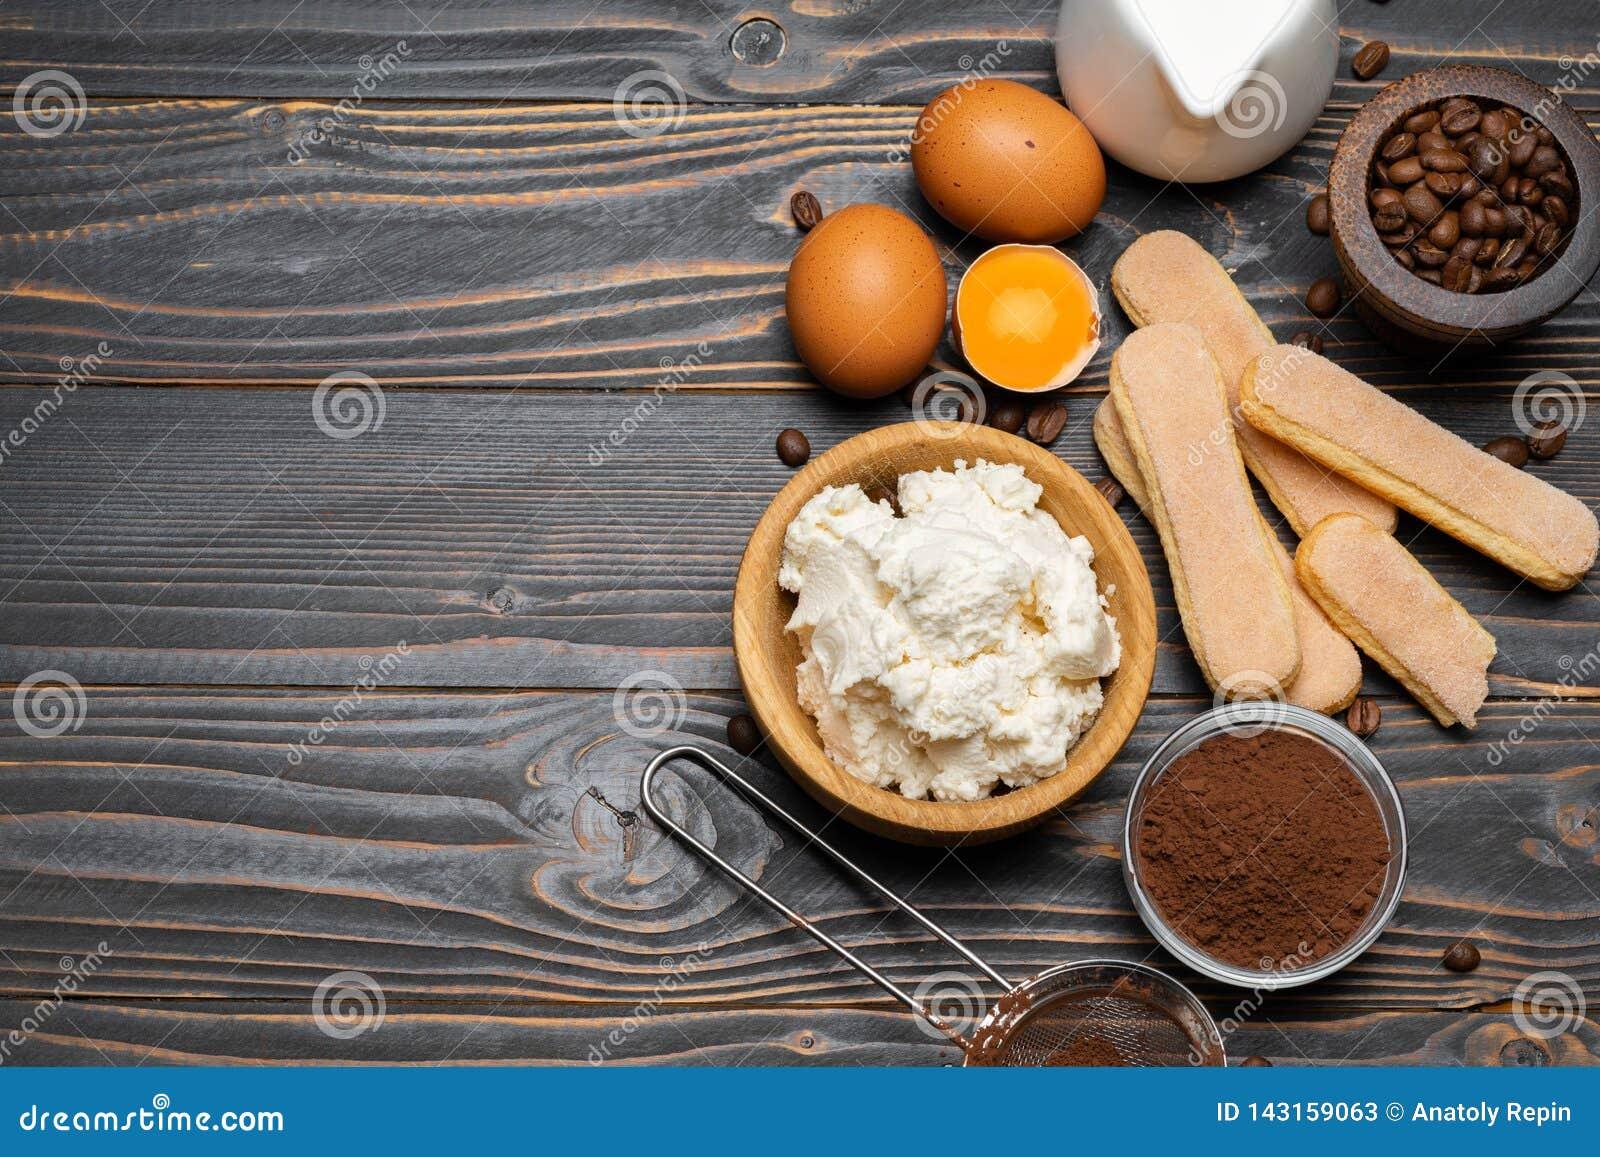 Składniki dla kulinarnego tiramisu Savoiardi biskwitowi ciastka, mascarpone, ser, cukier, kakao, kawa i jajko -,